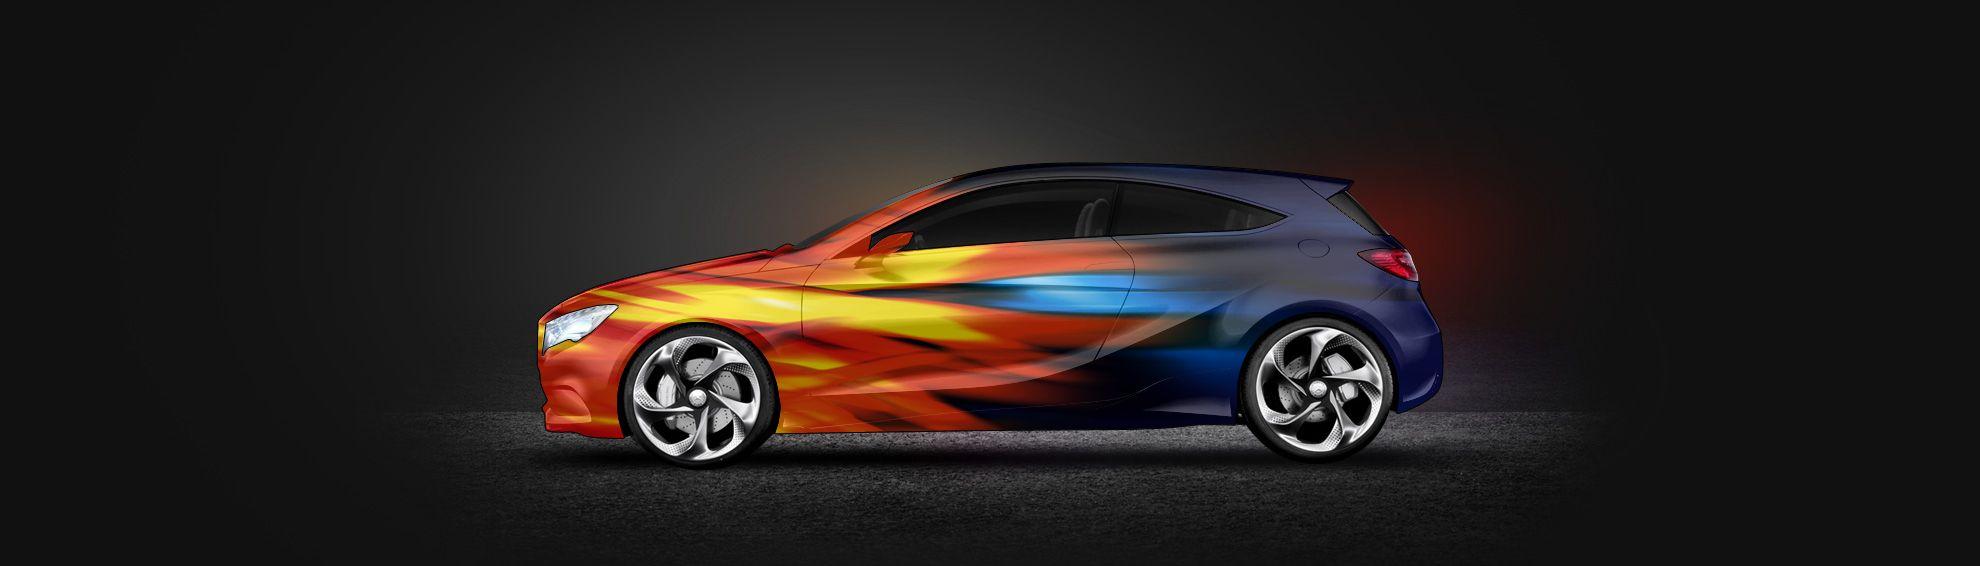 Car Wraps Google Search Corolla Wrap Ideasa Pinterest Car